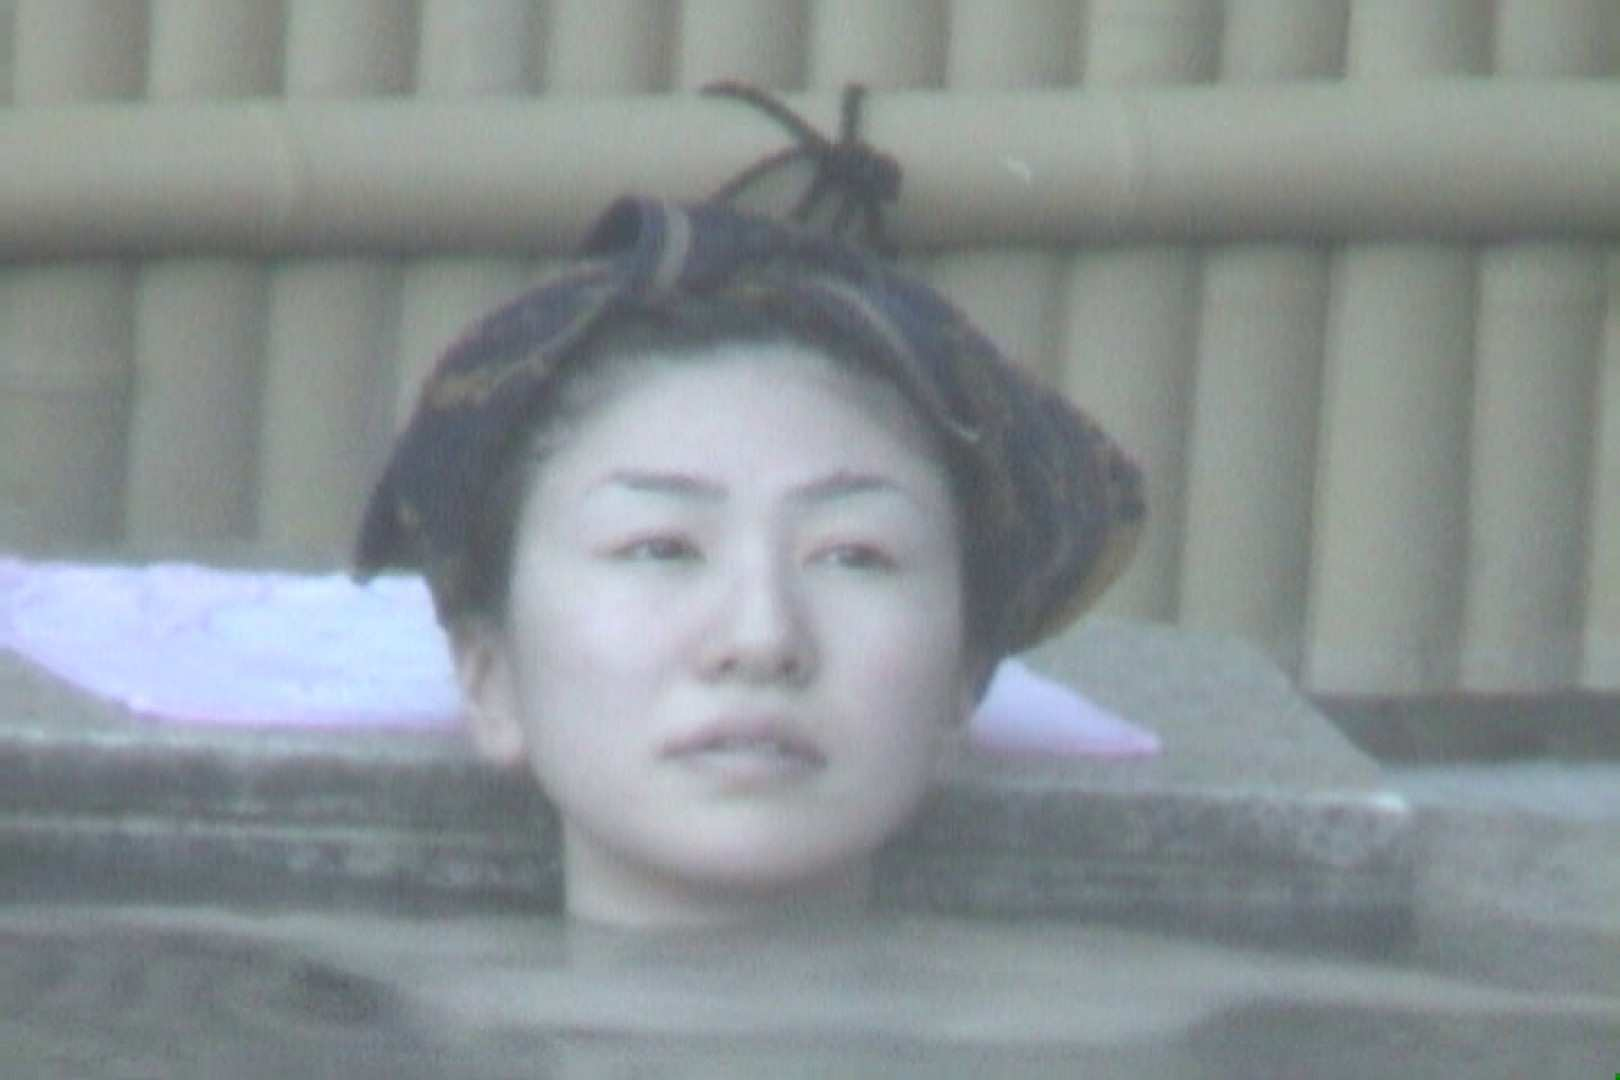 Aquaな露天風呂Vol.607 OL女体 盗み撮り動画キャプチャ 56連発 53